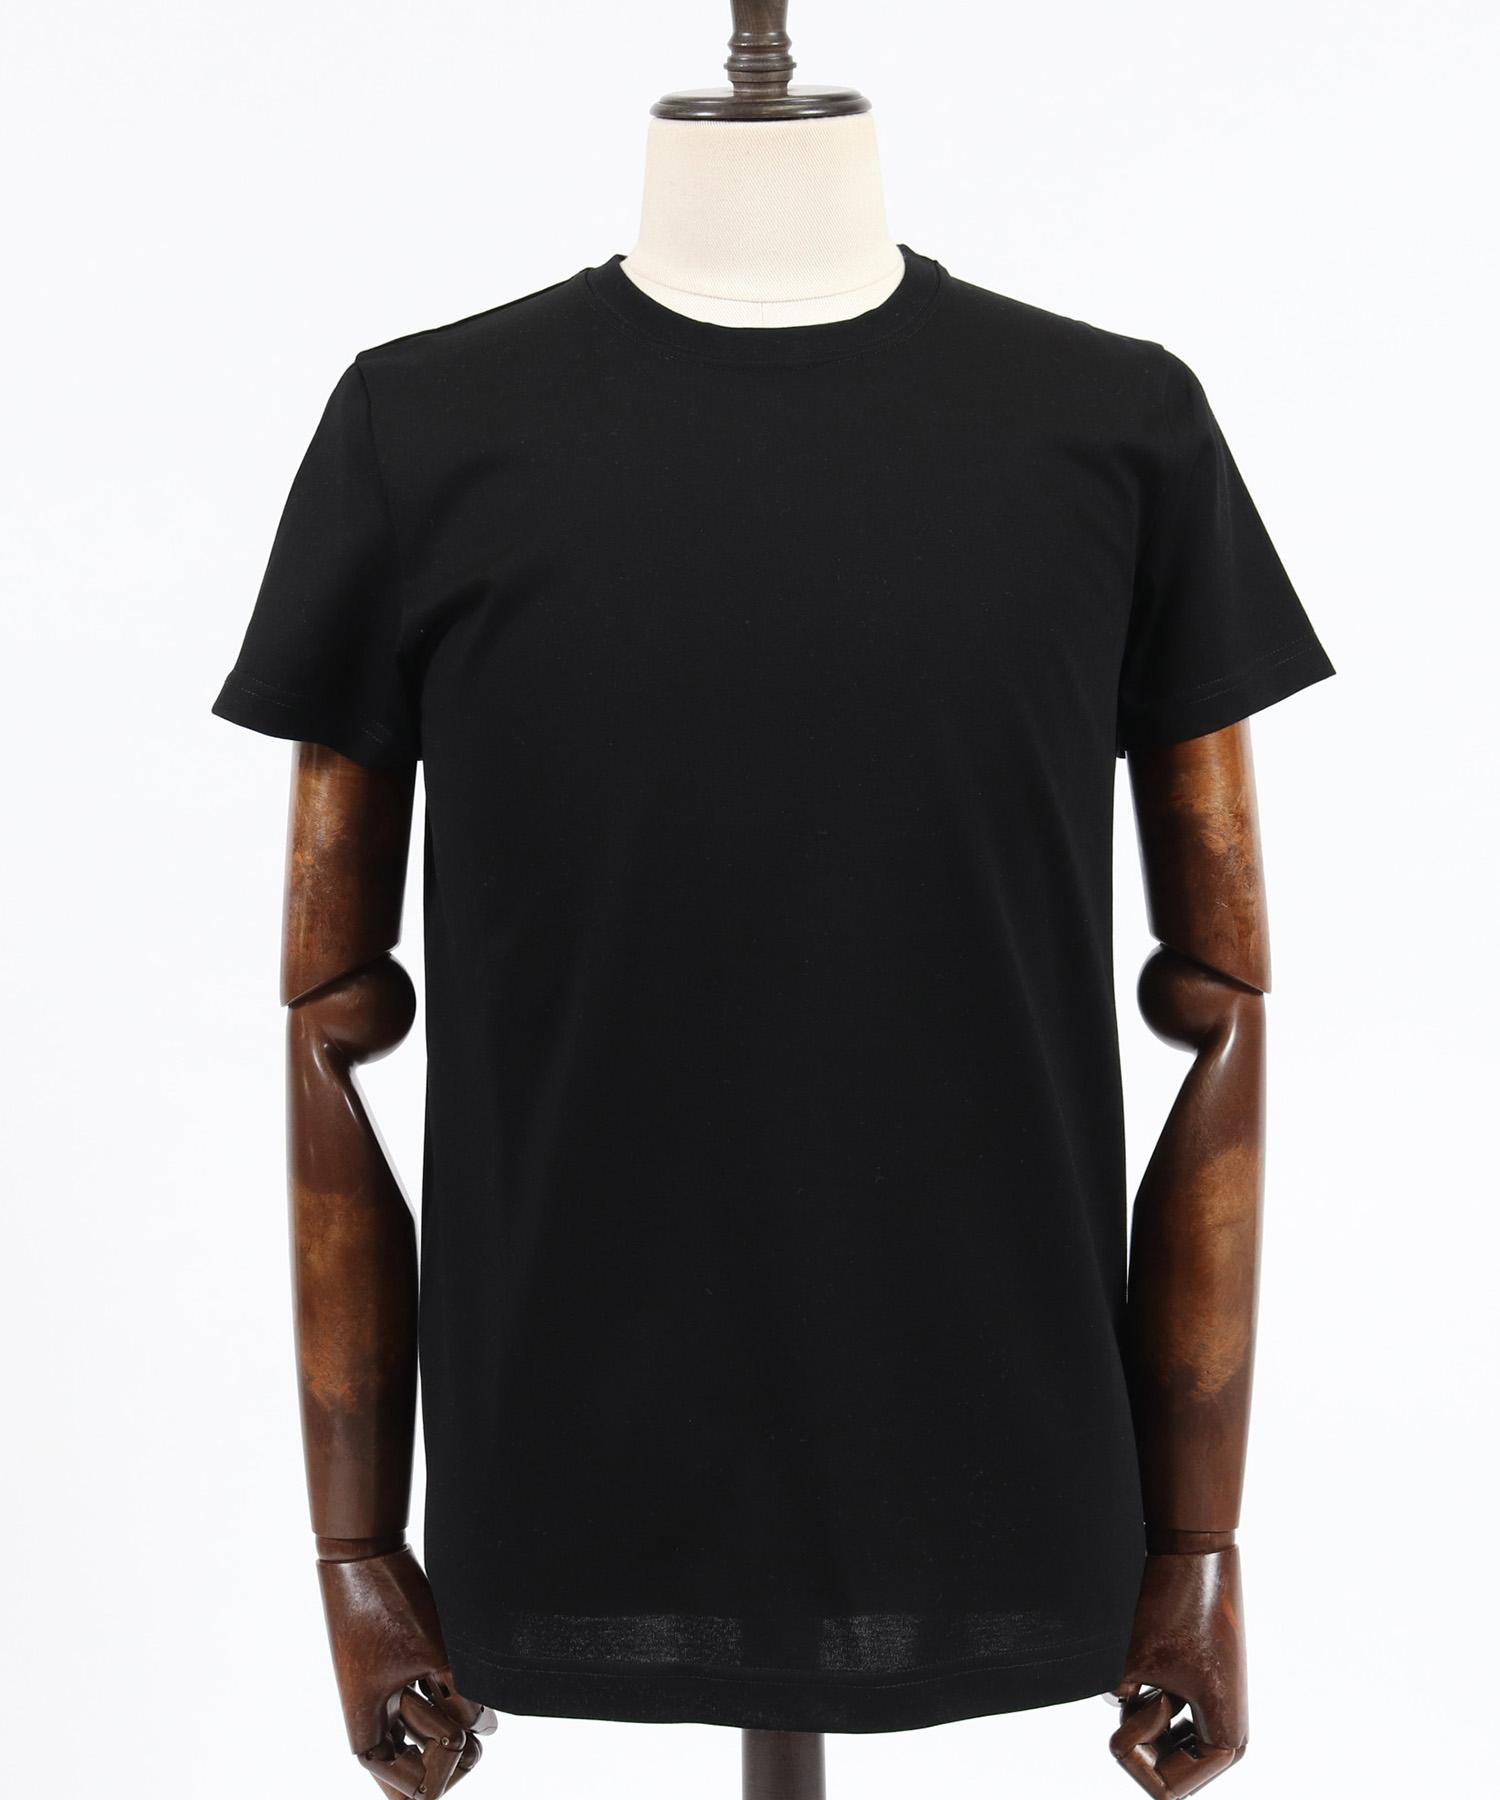 【junhashimoto(ジュンハシモト)】101SERIBU C S-S Tシャツ(1101920003)